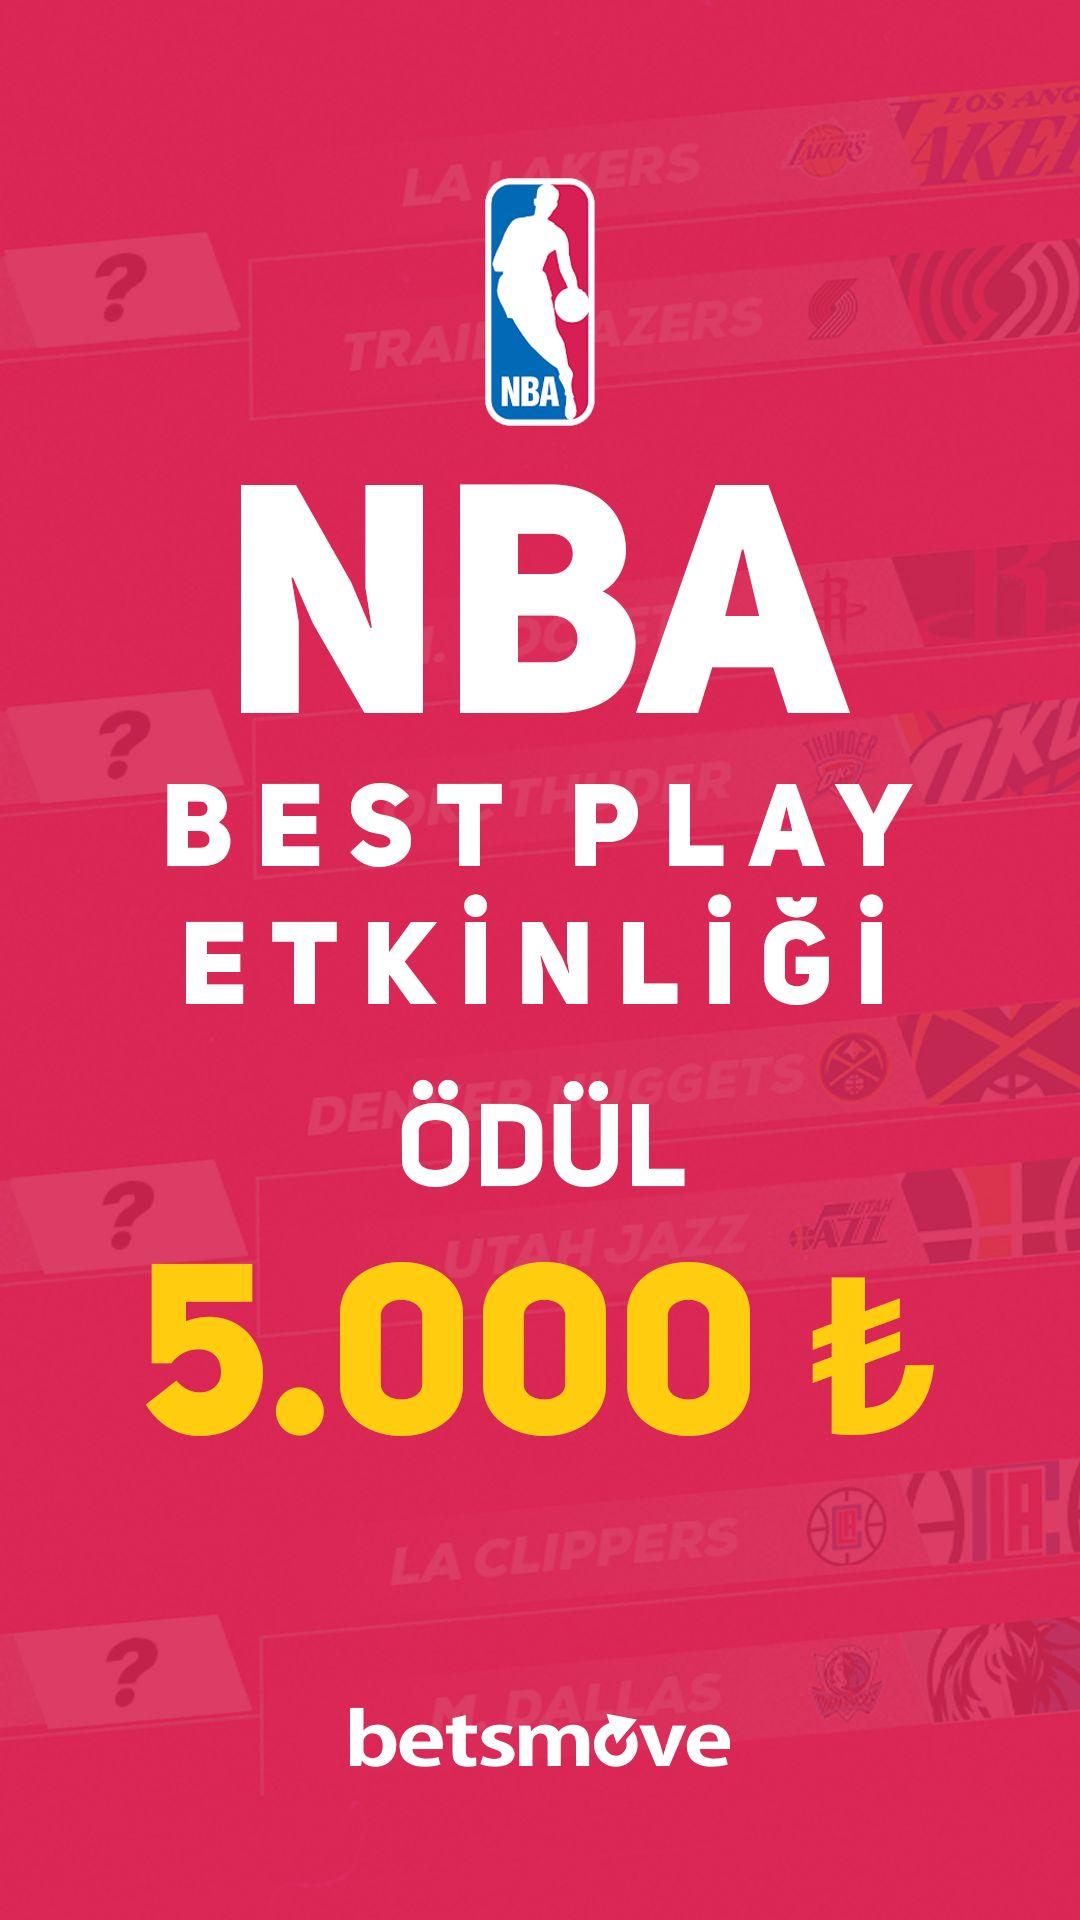 Nba Best Play Etkinligi Odul 5 000tl 2020 Nba